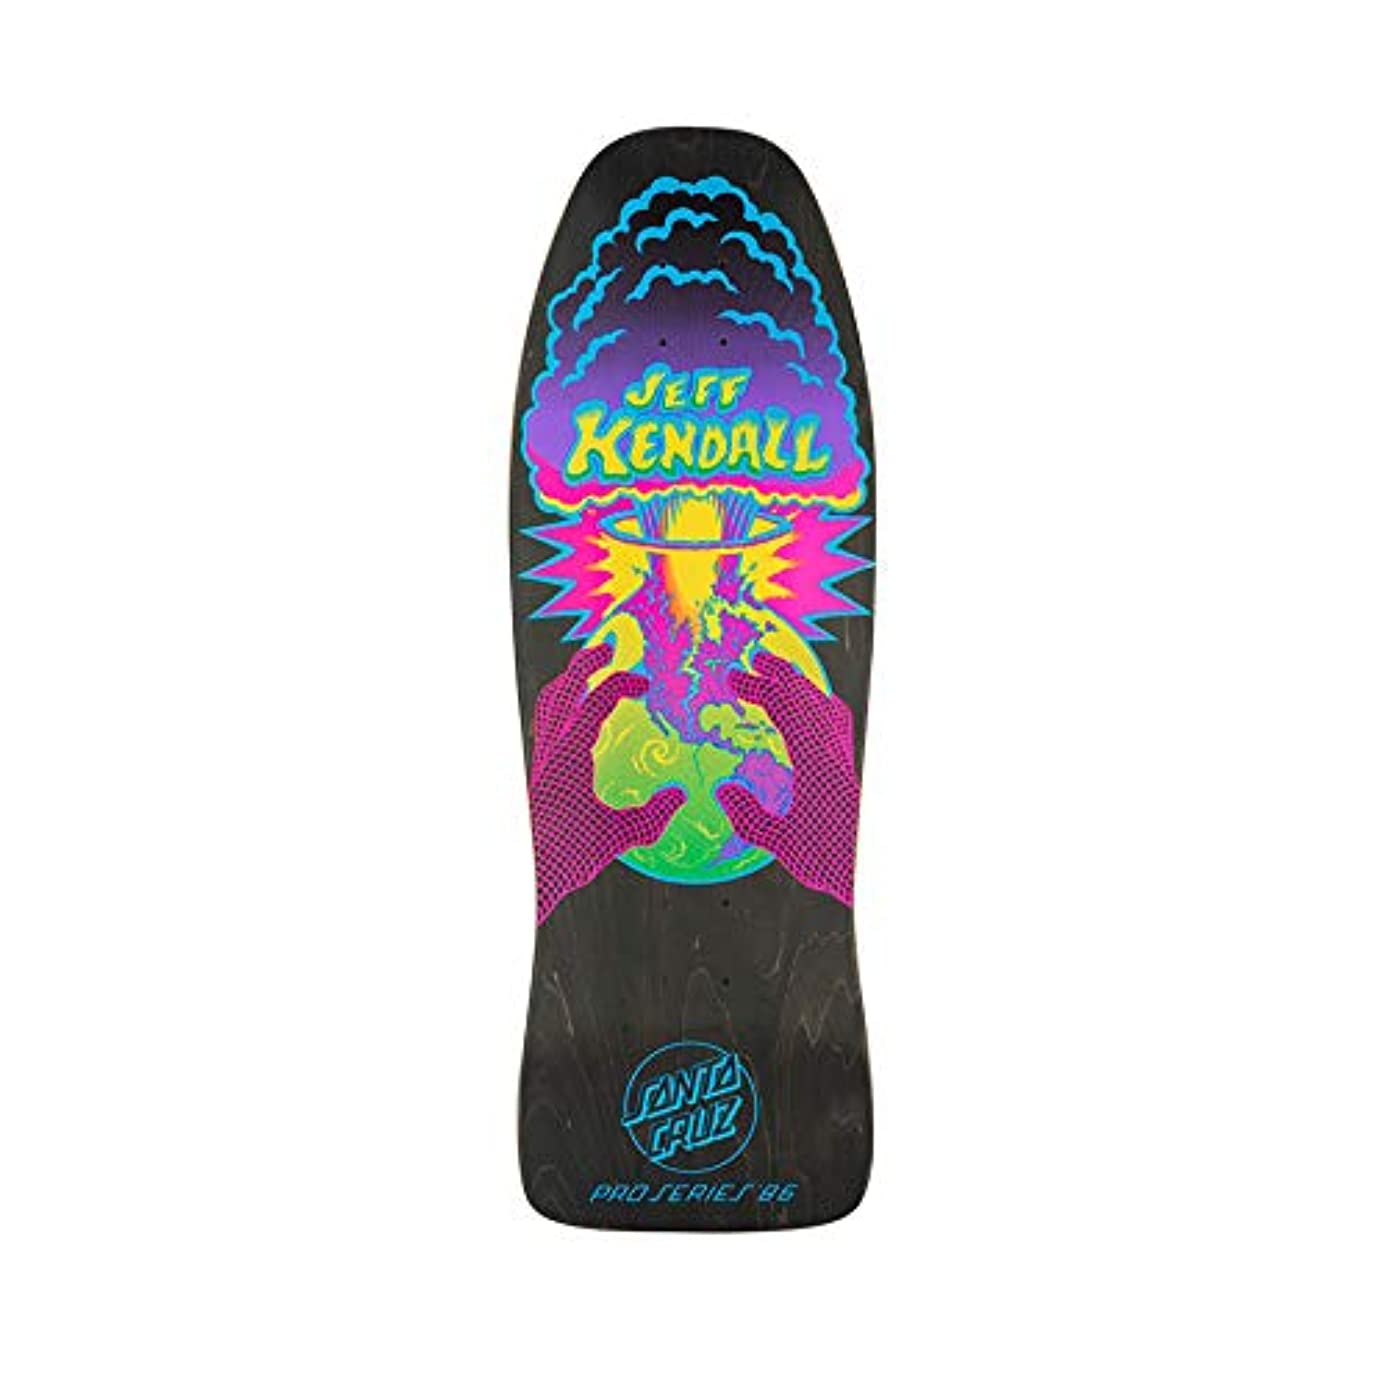 Santa Cruz Skateboard Deck Kendall End of The World Matte Black Stain